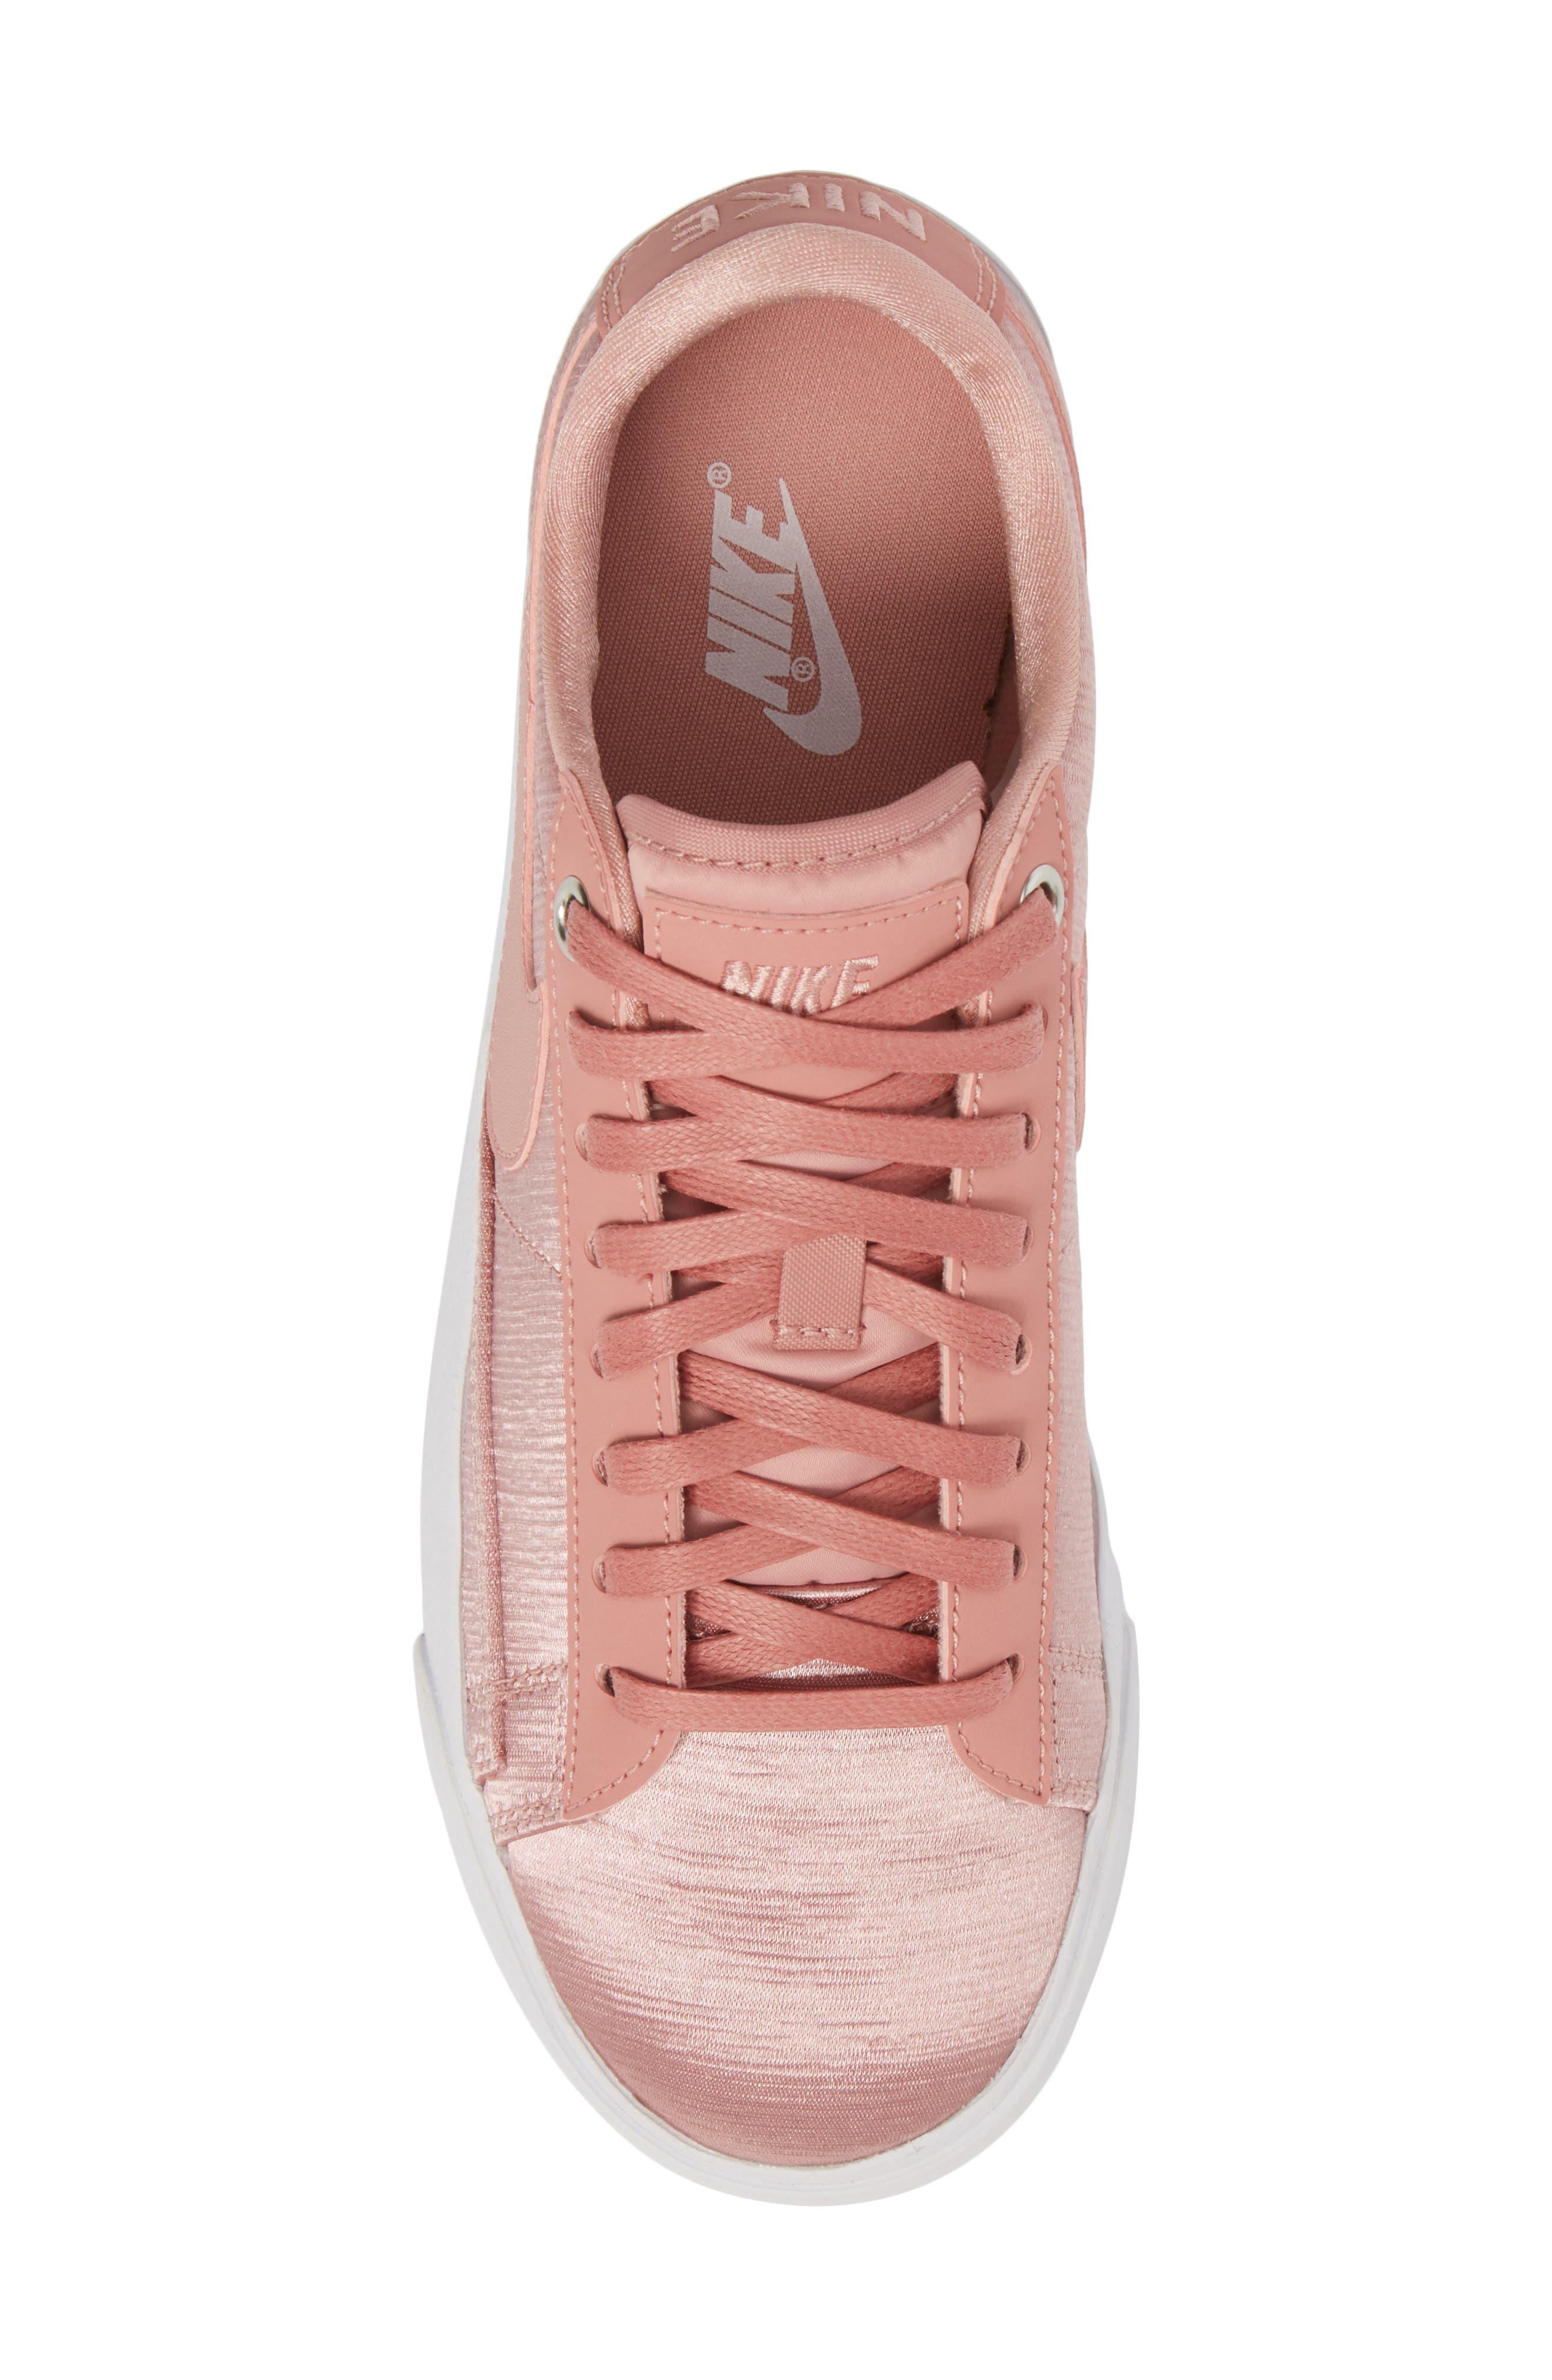 Blazer Low SE Sneaker,                             Alternate thumbnail 5, color,                             RUST PINK/ RUST PINK